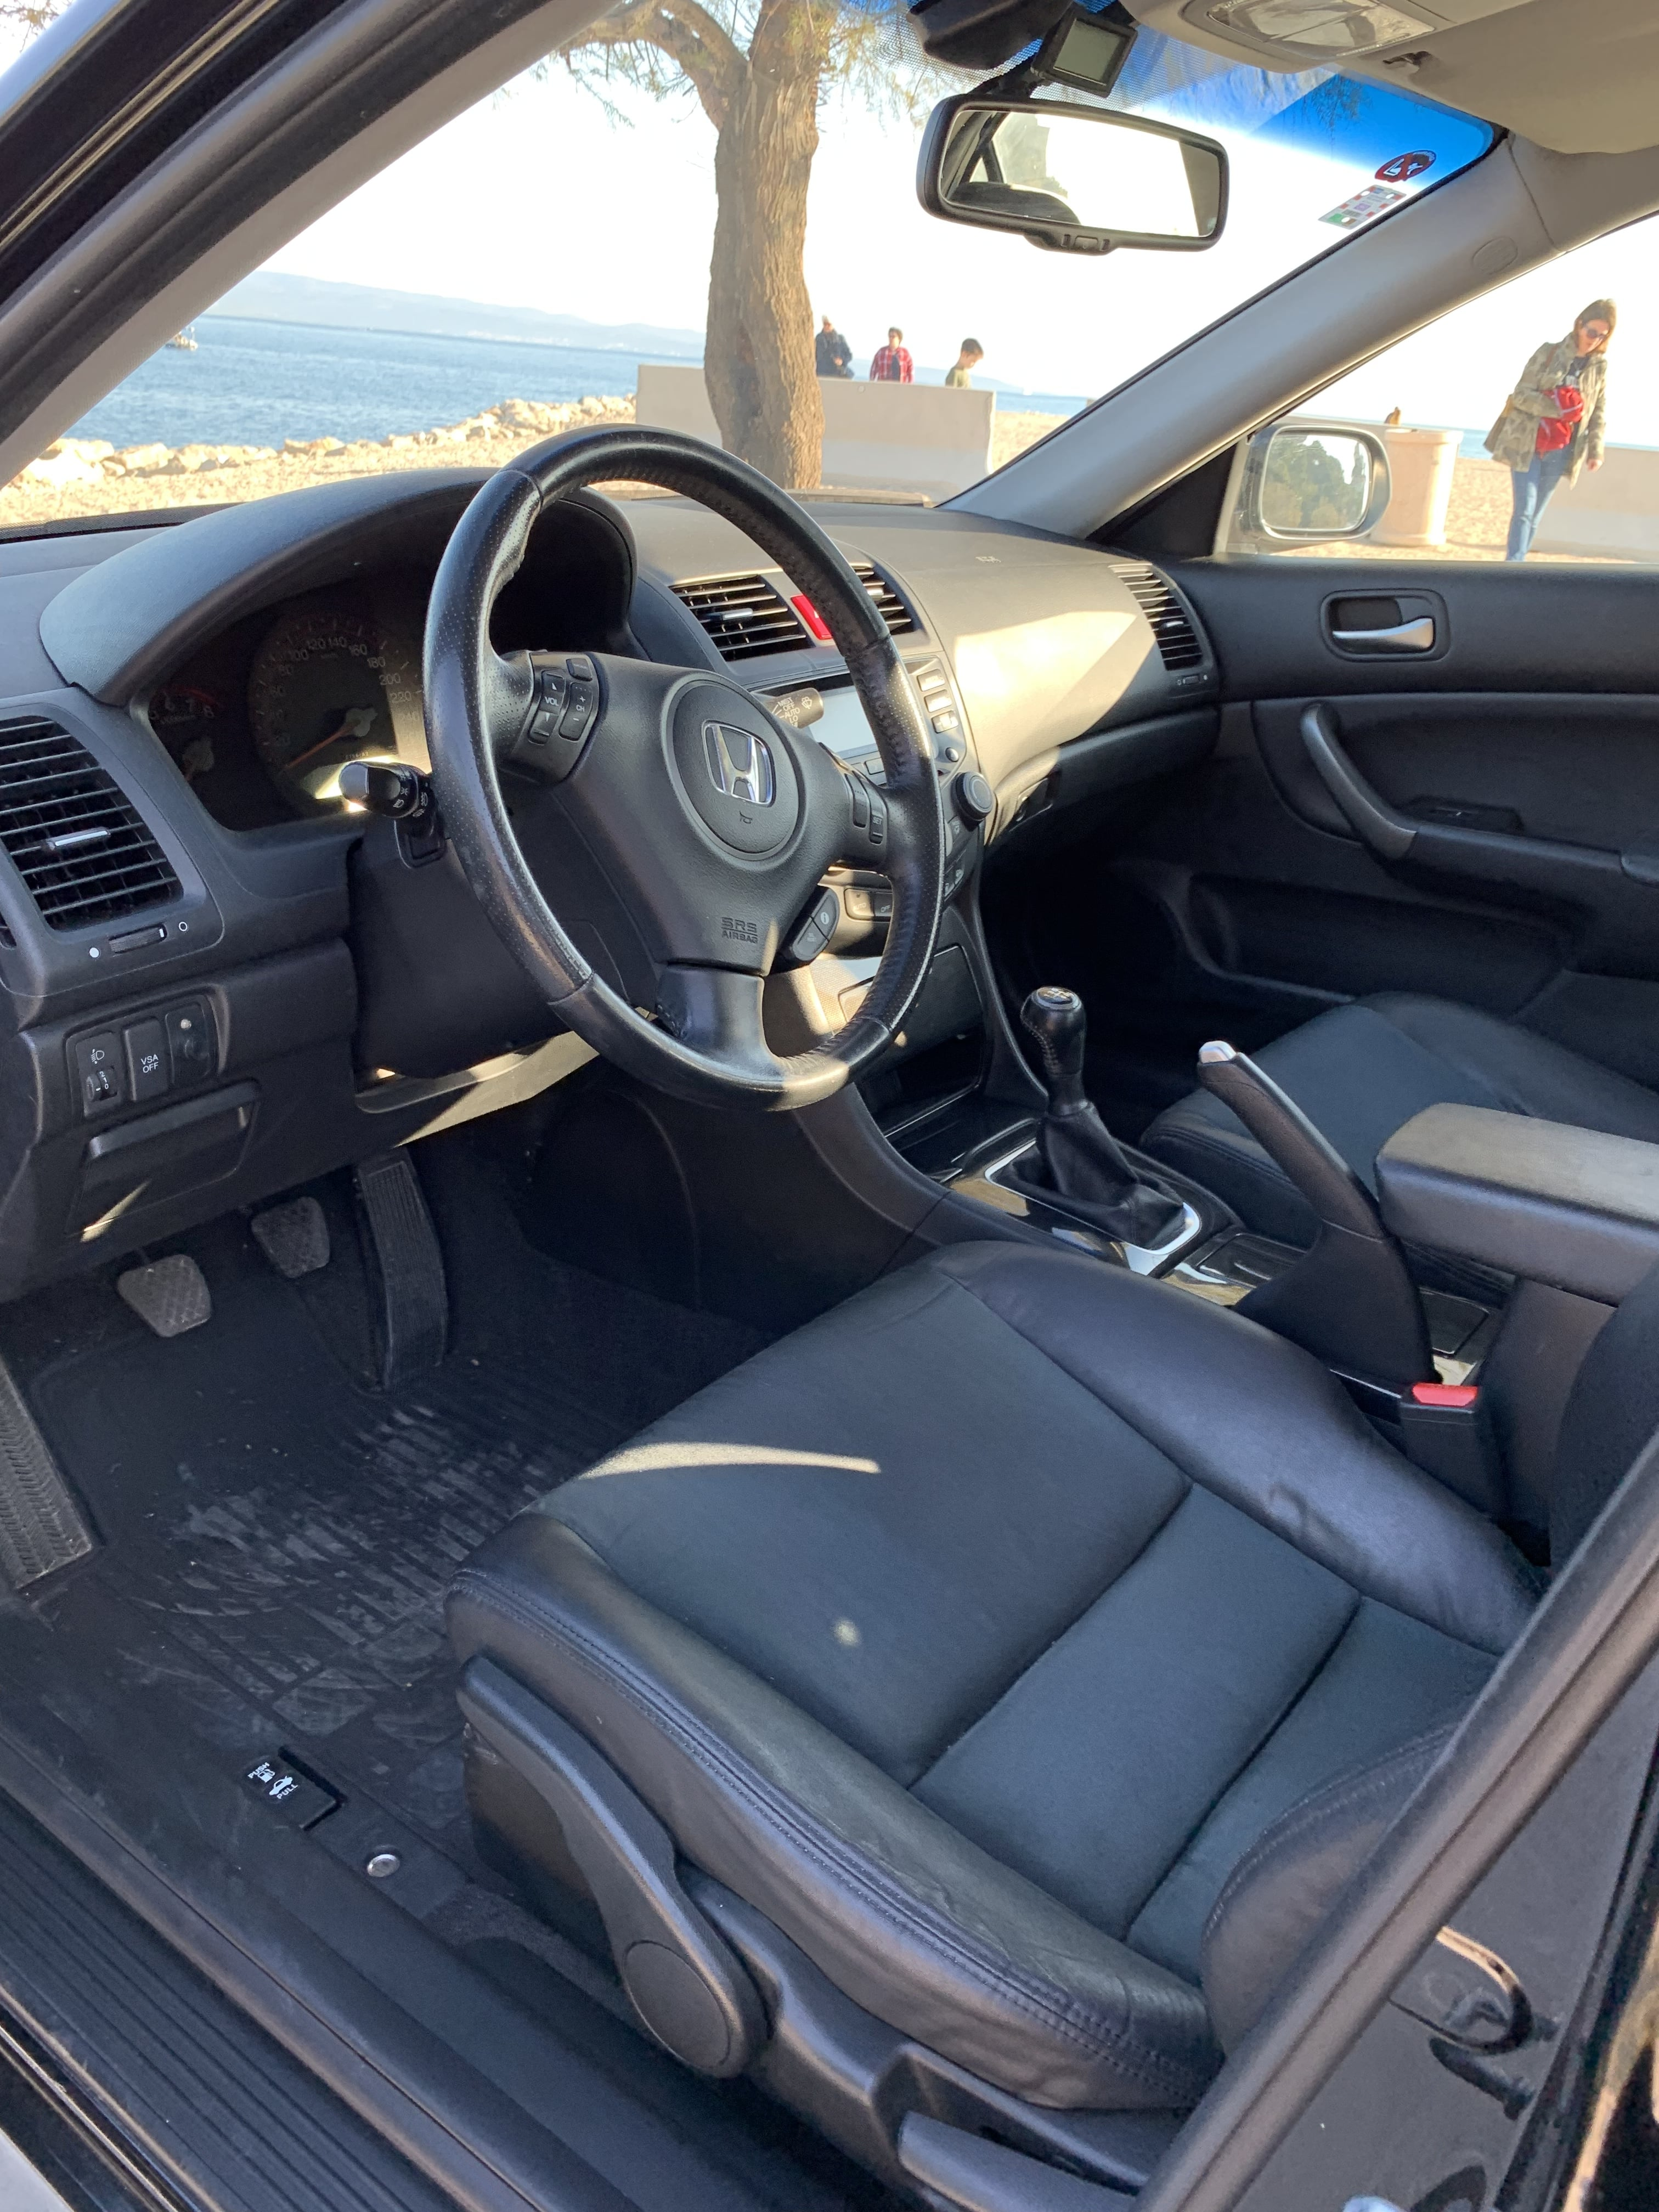 Honda Accord 2.0 sport (105 000km)